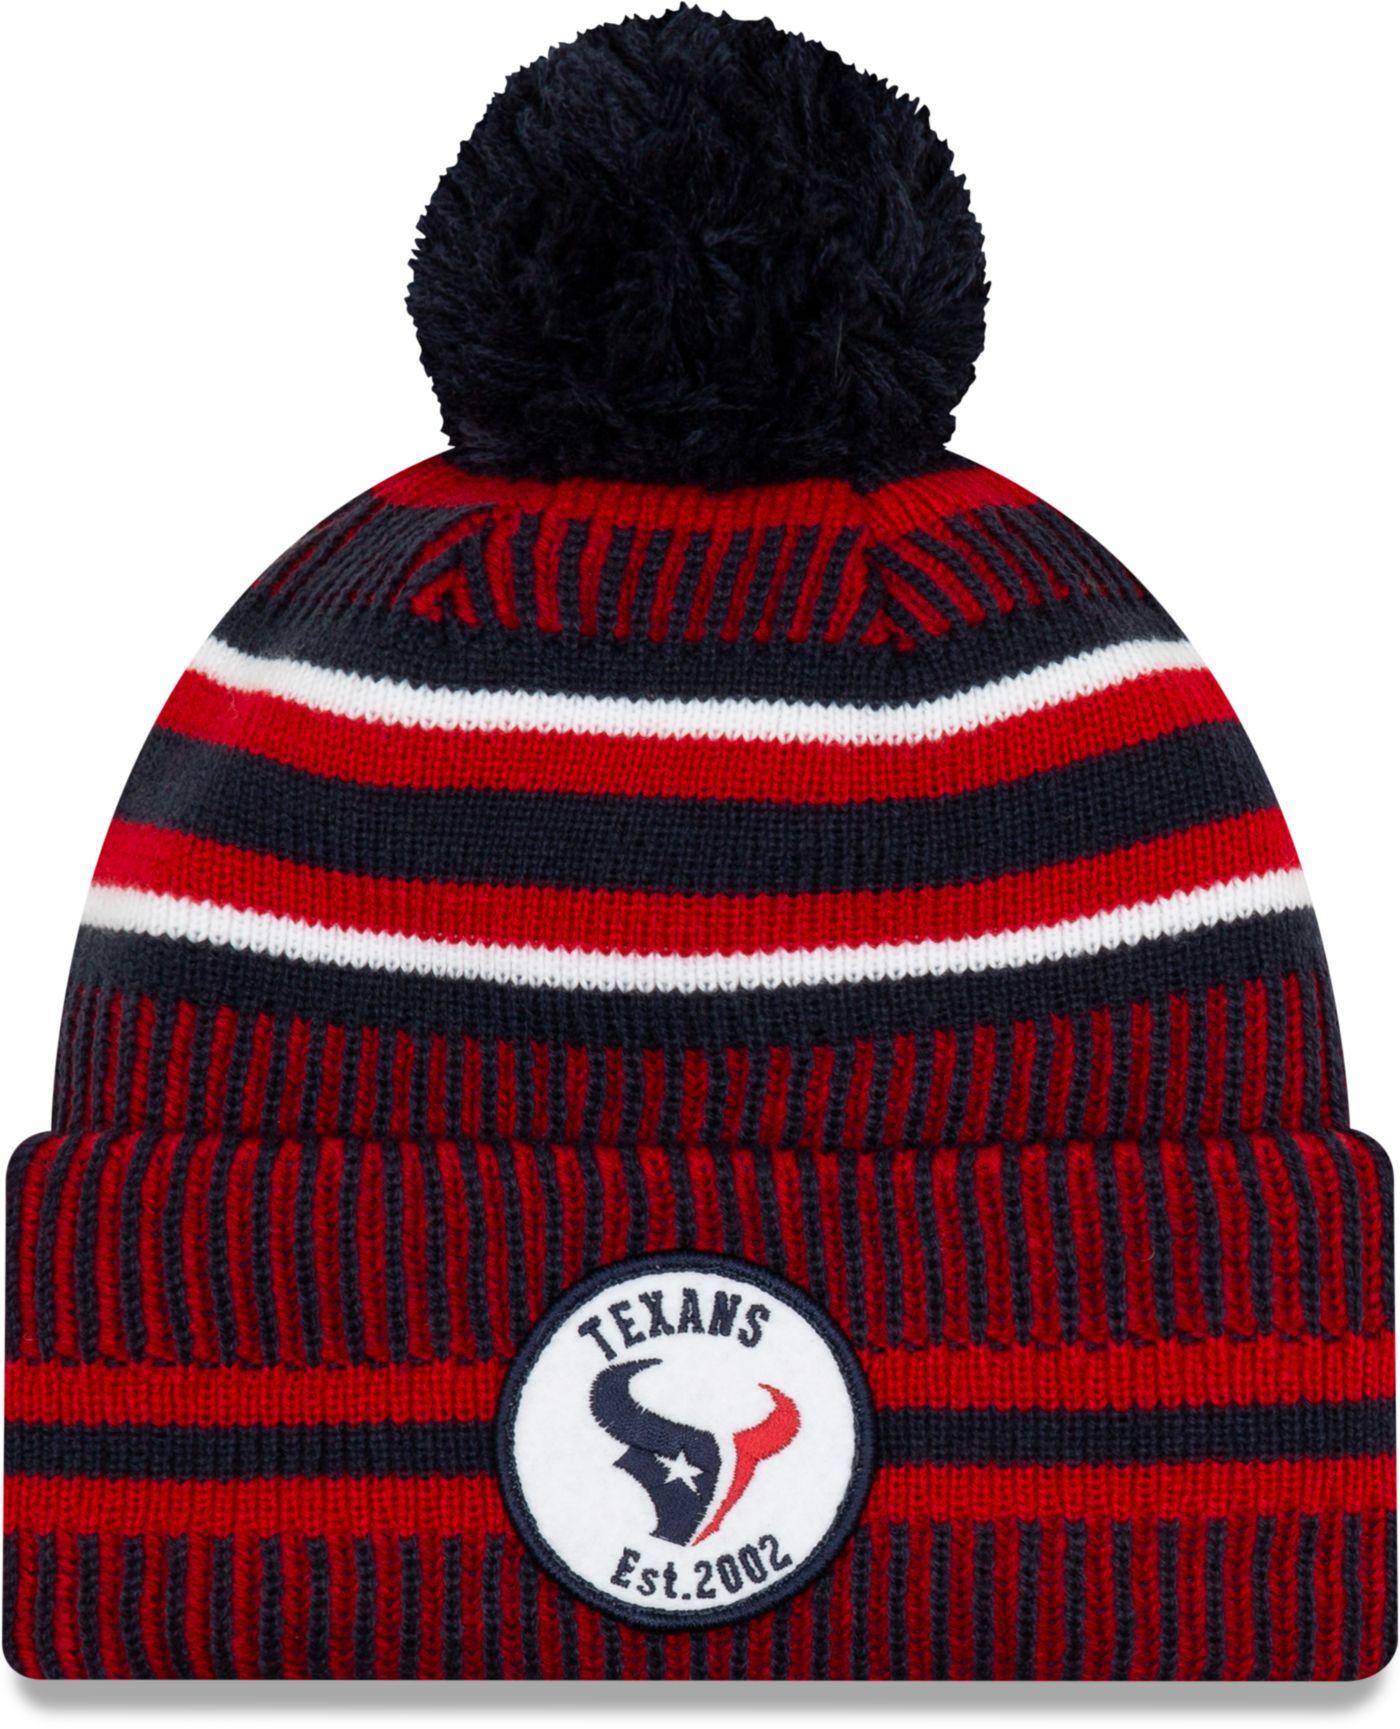 New Era Men's Houston Texans Sideline Home Sport Pom Knit